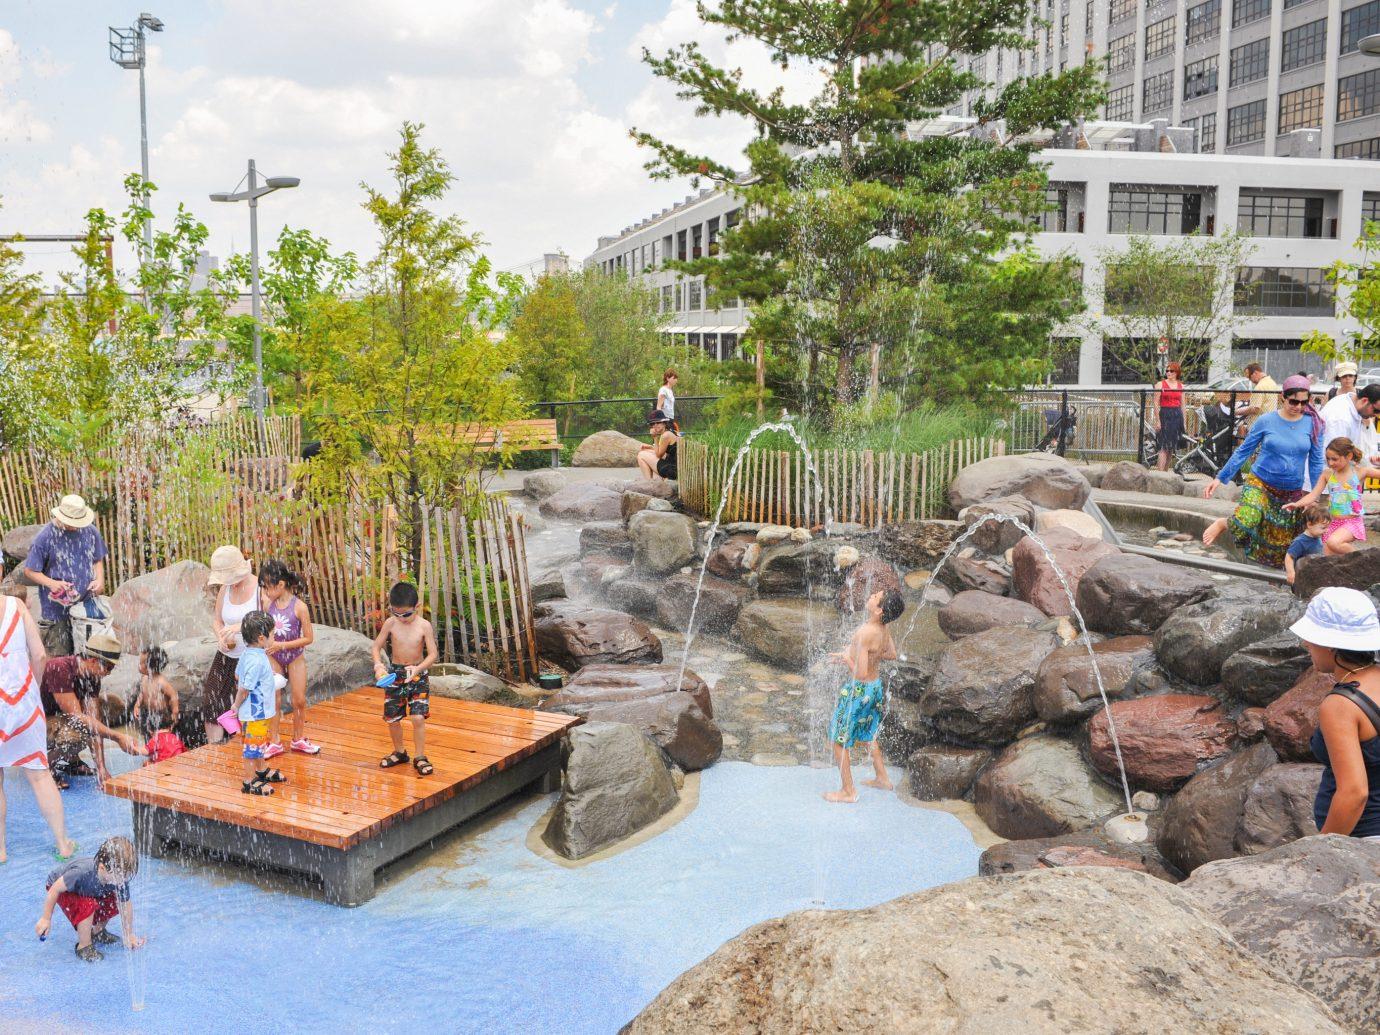 Trip Ideas tree outdoor water feature park amusement park Water park fountain